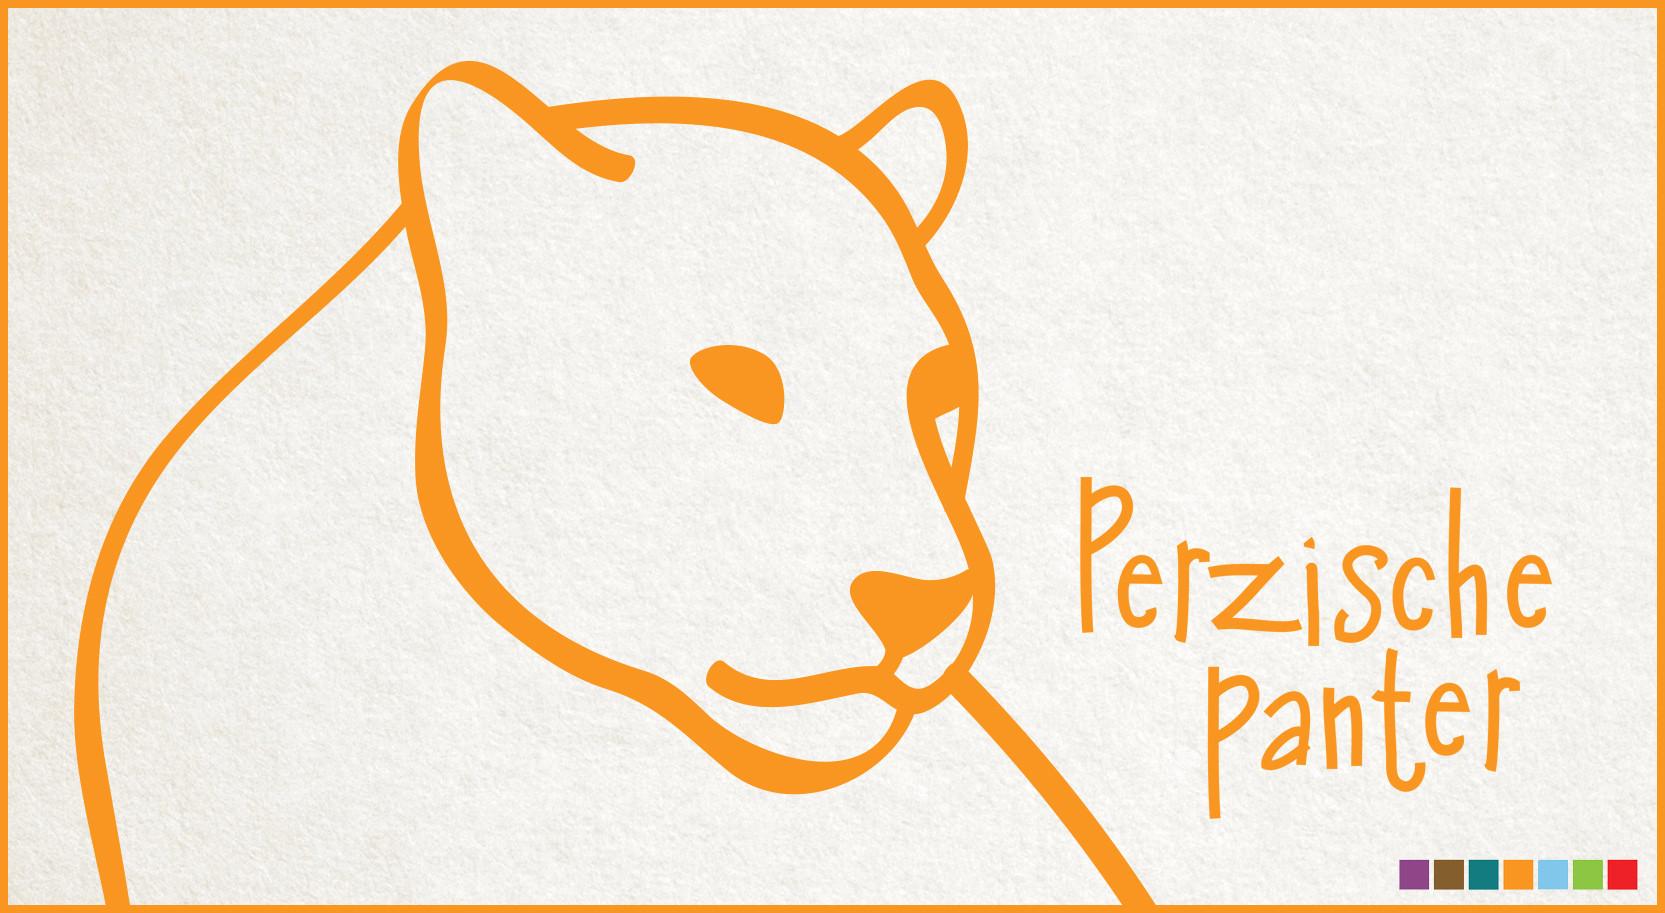 DPA_Perzischepanter.jpg